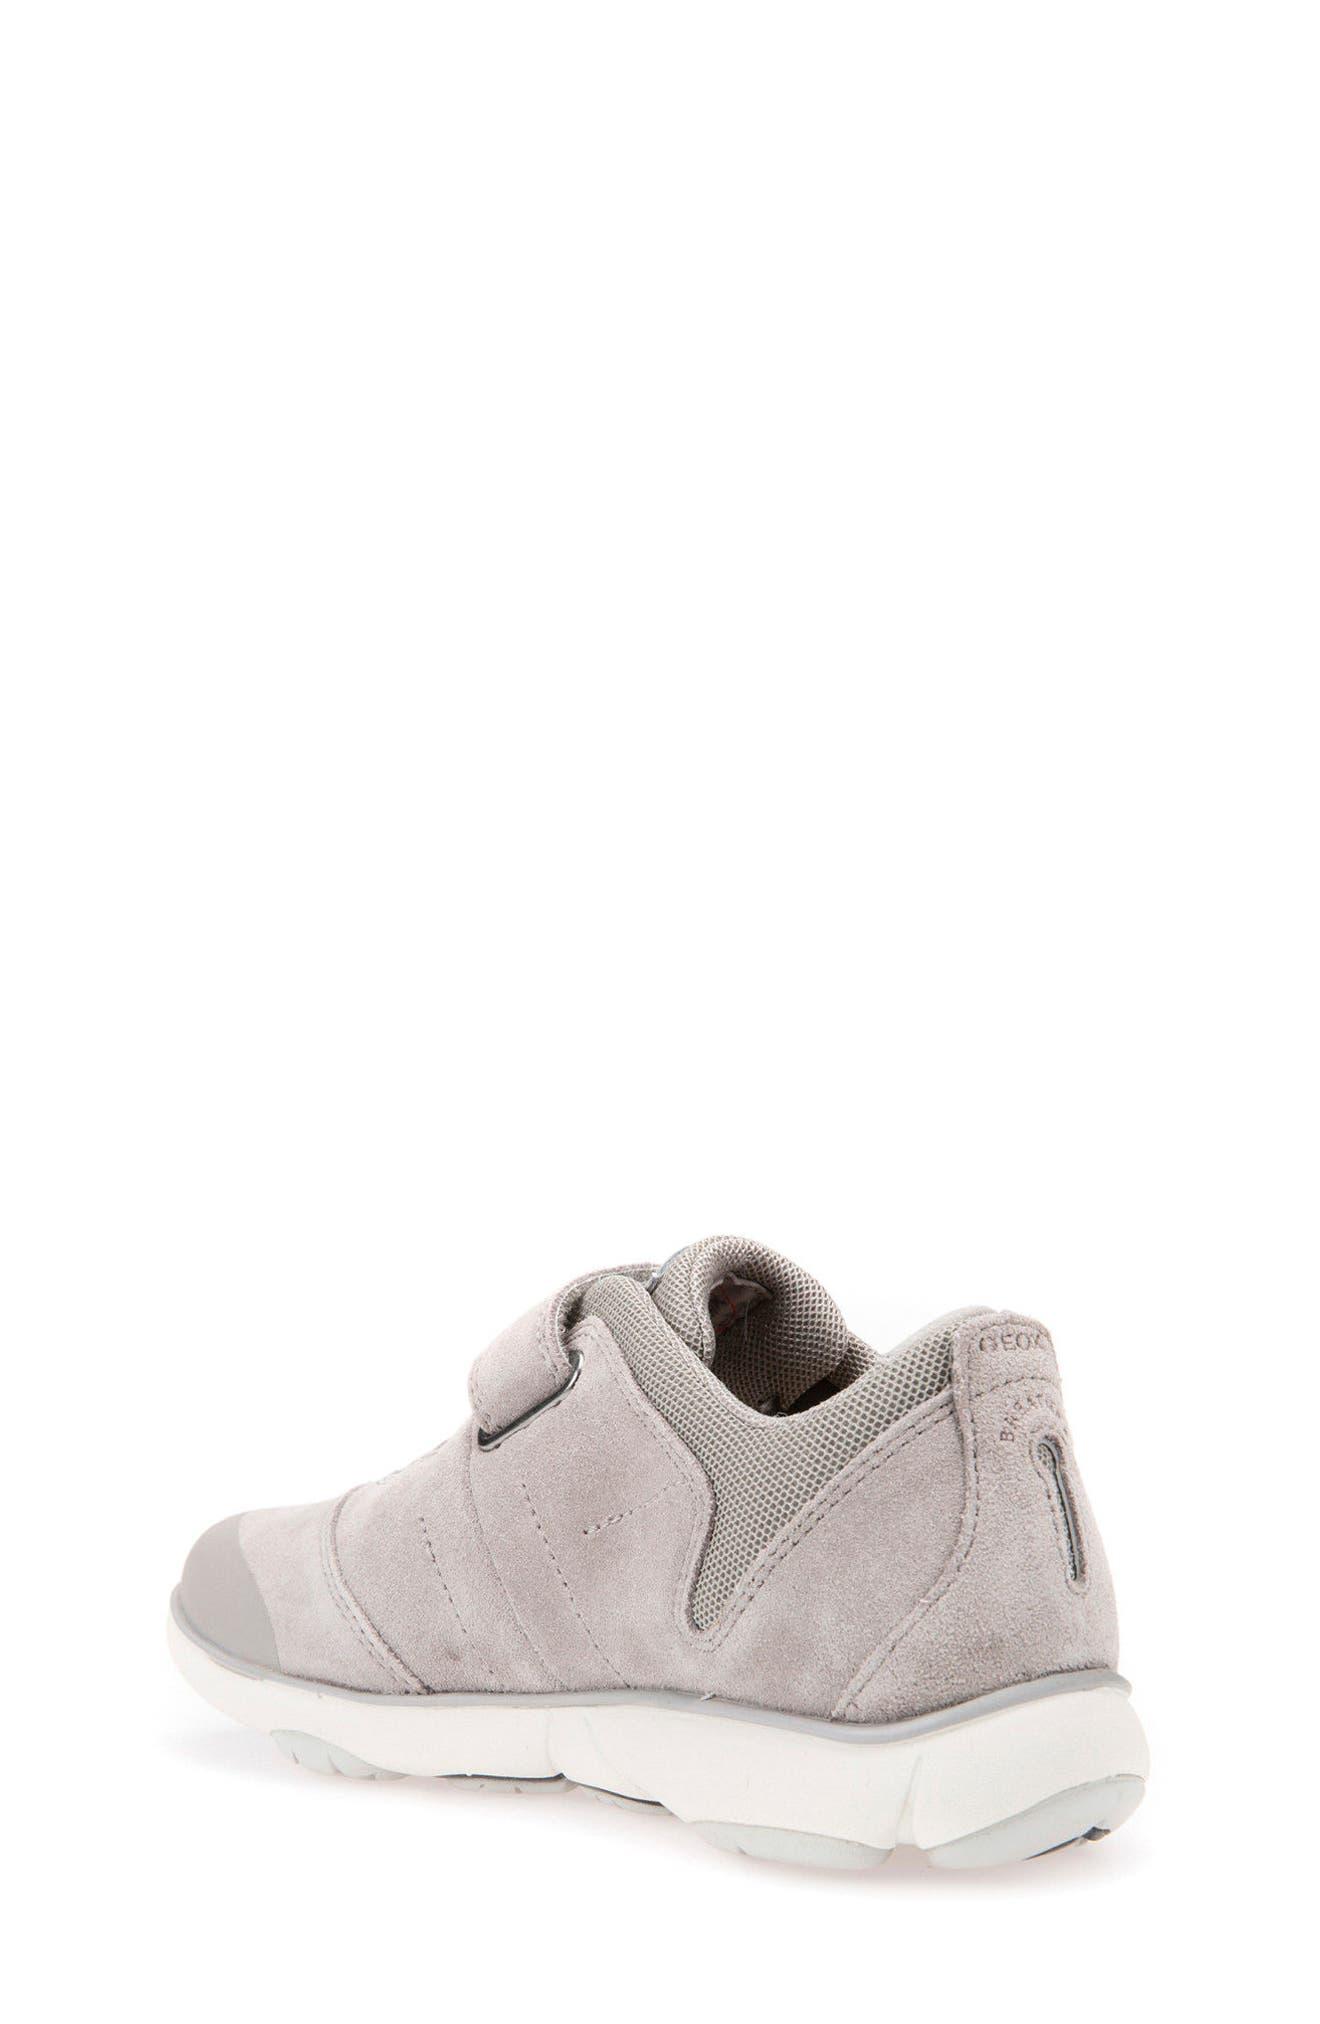 Nebula Low Top Sneaker,                             Alternate thumbnail 2, color,                             Grey